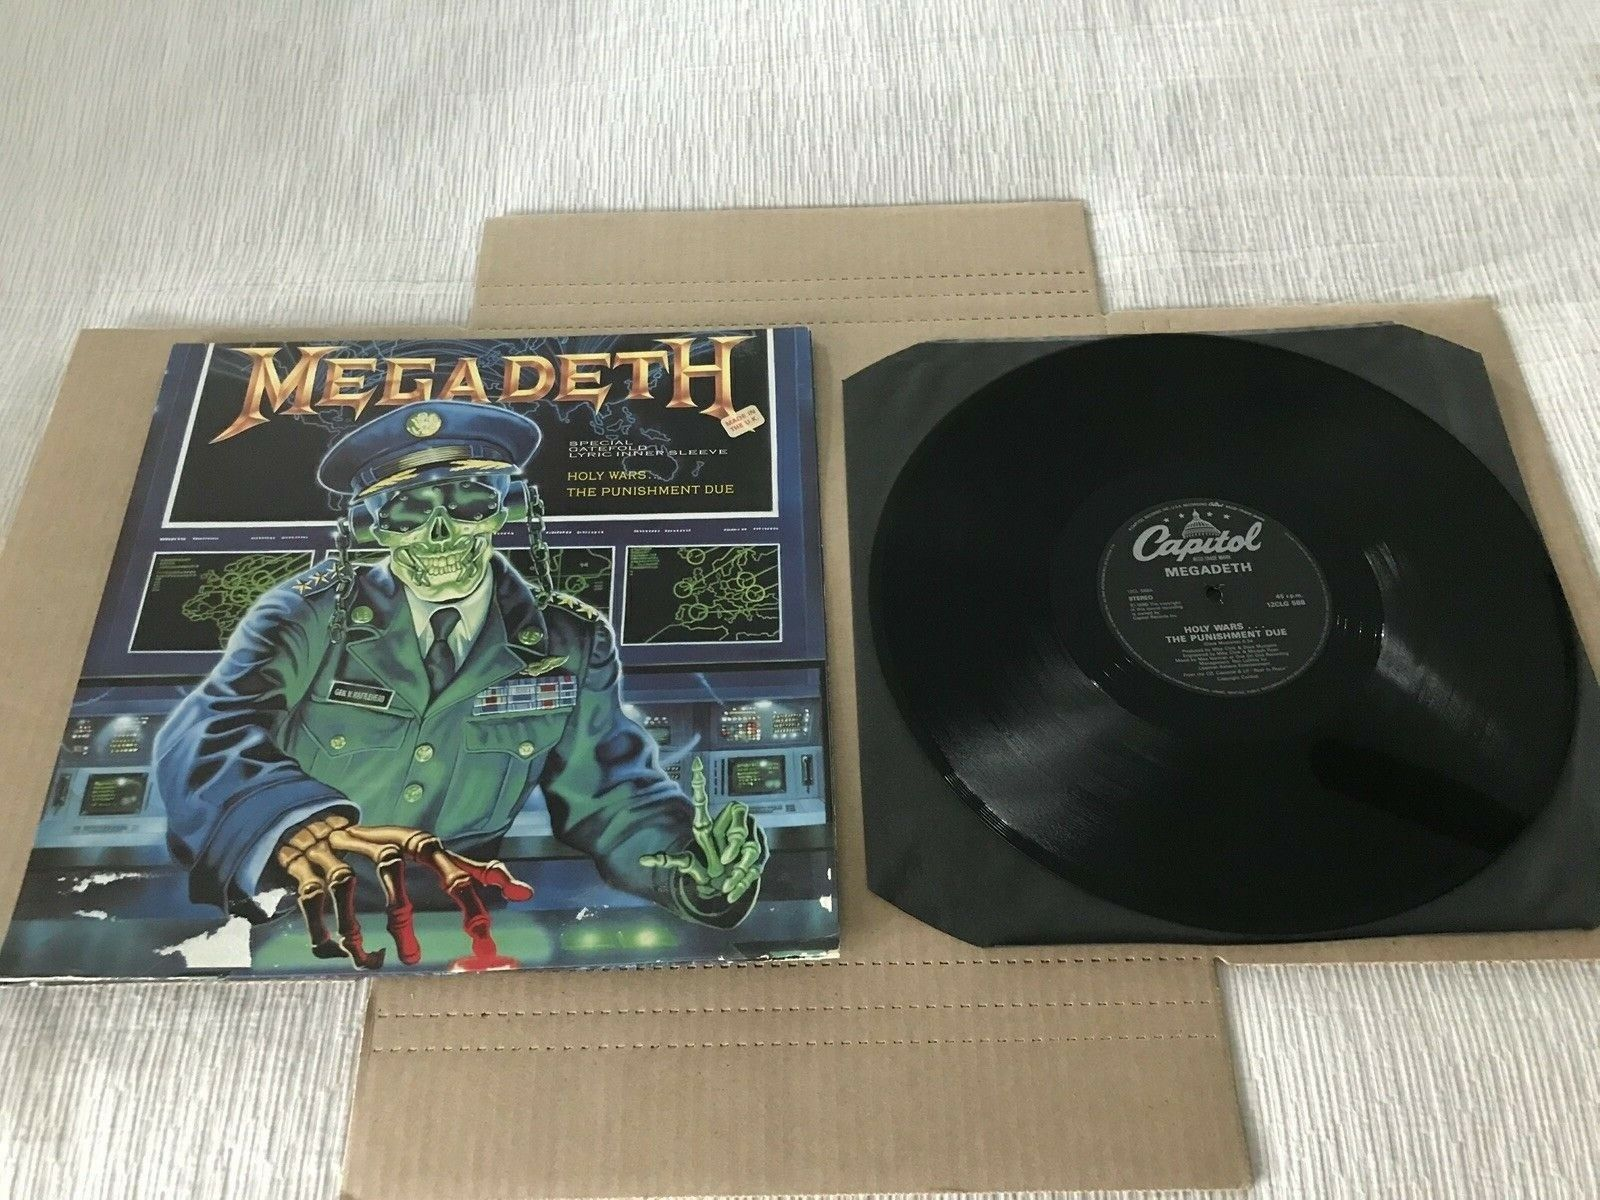 Megadeth Rust In Peace 1990 1st Press Lp Record Uk Import Vinyl 12 Single